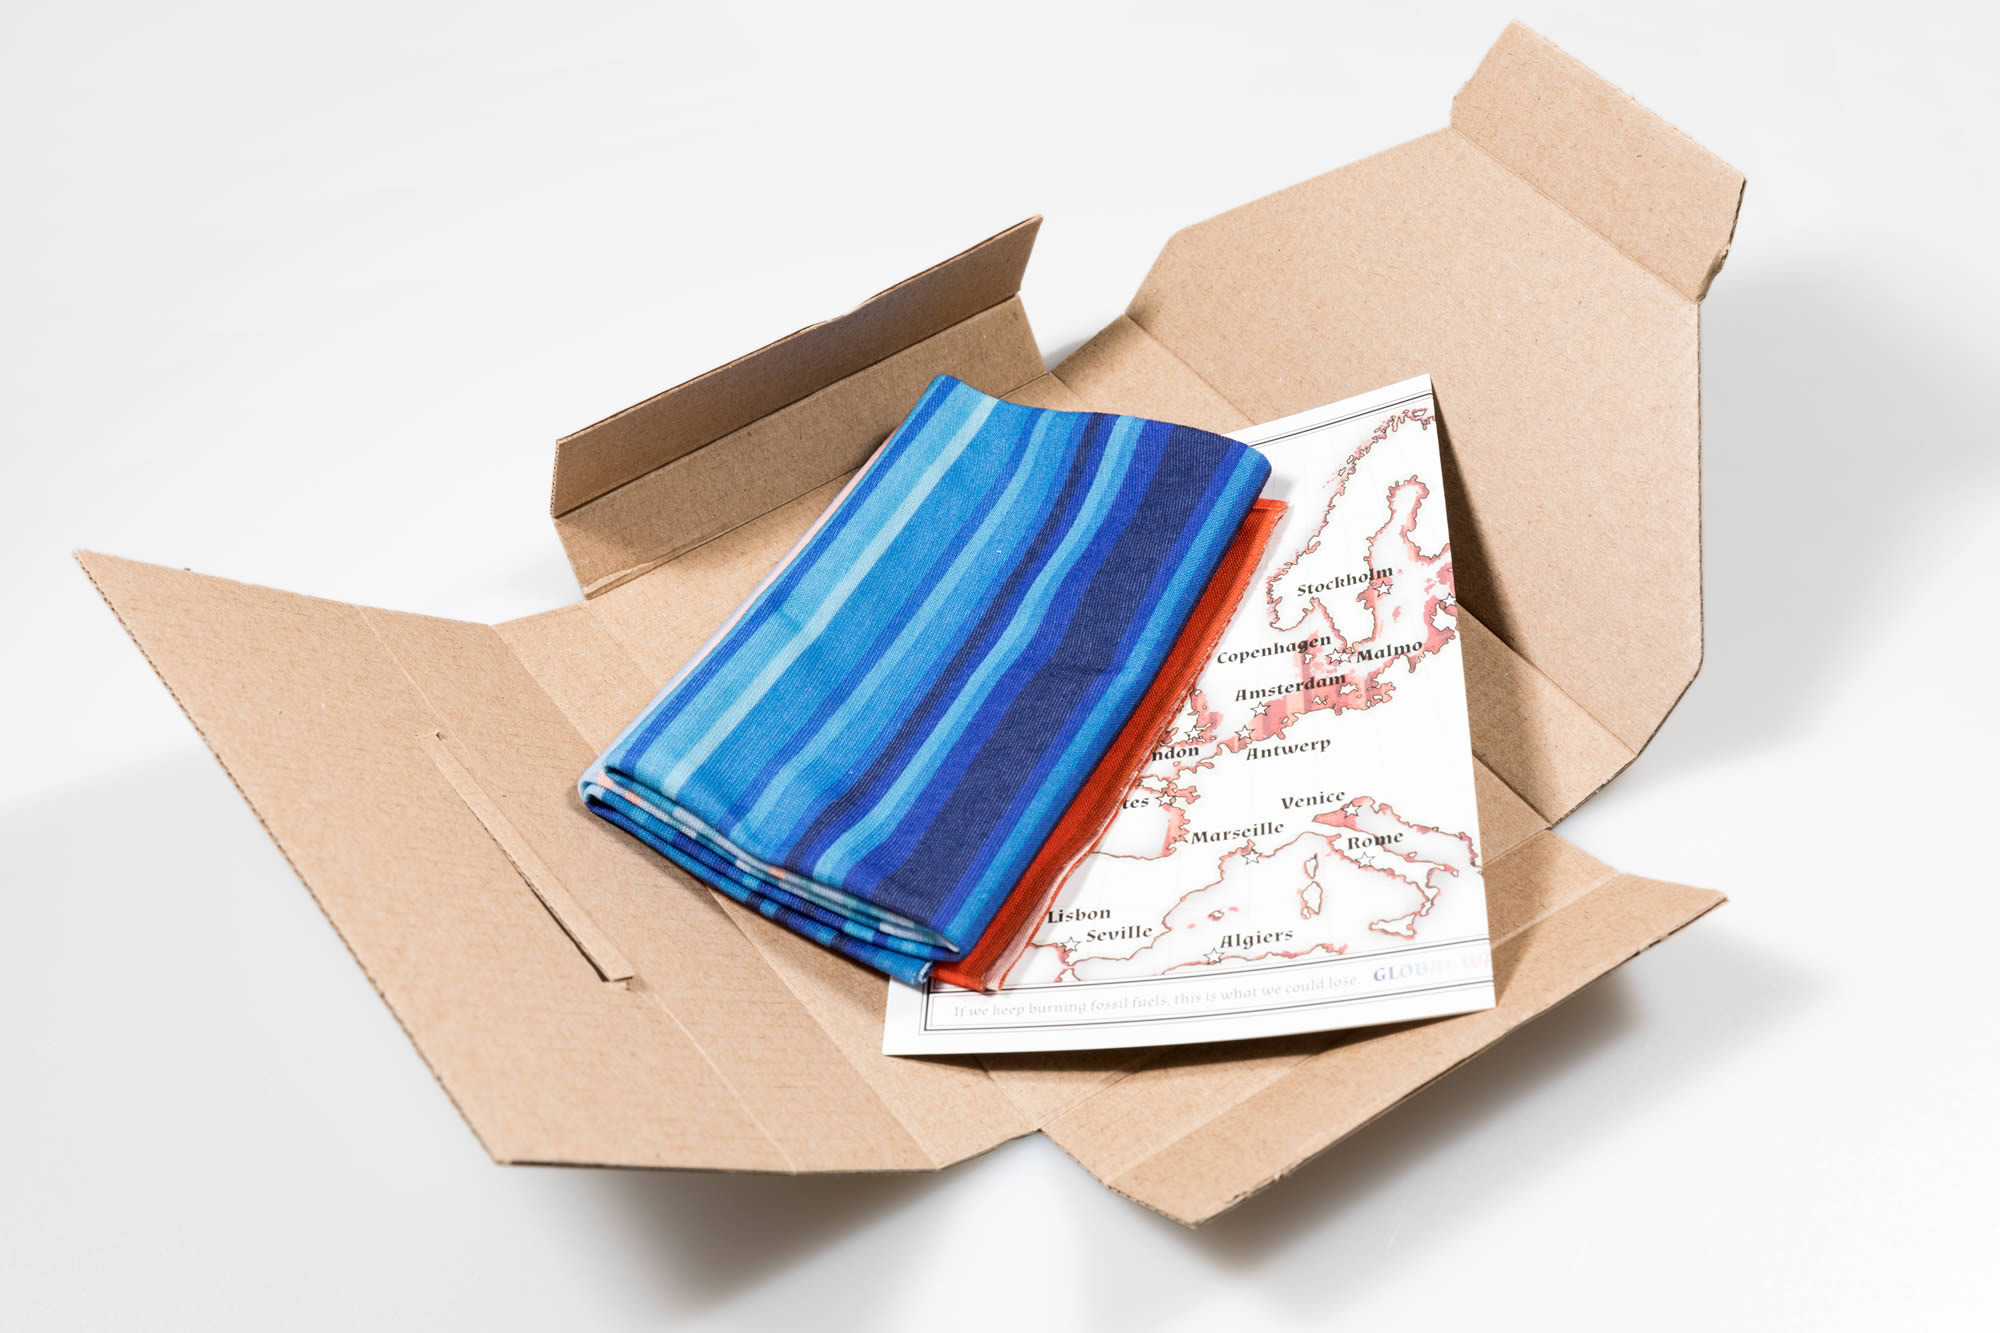 bandana package shot